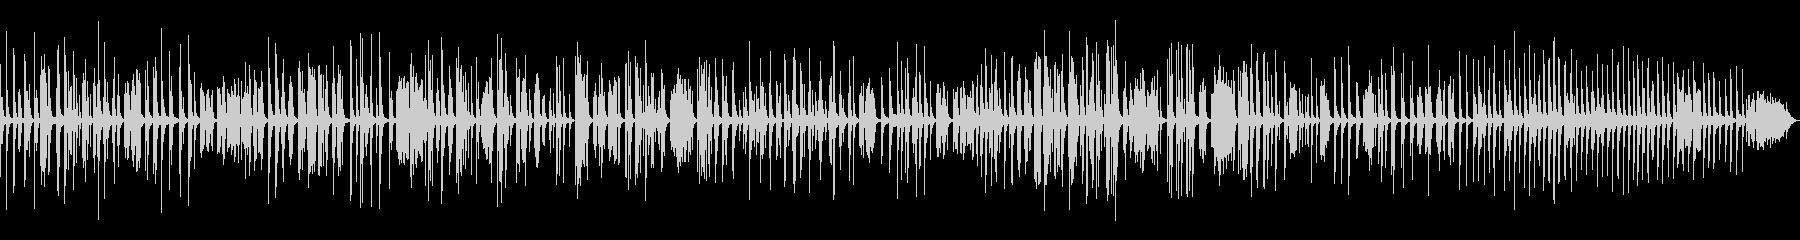 KANTちょうど25分のピアノ現代曲の未再生の波形